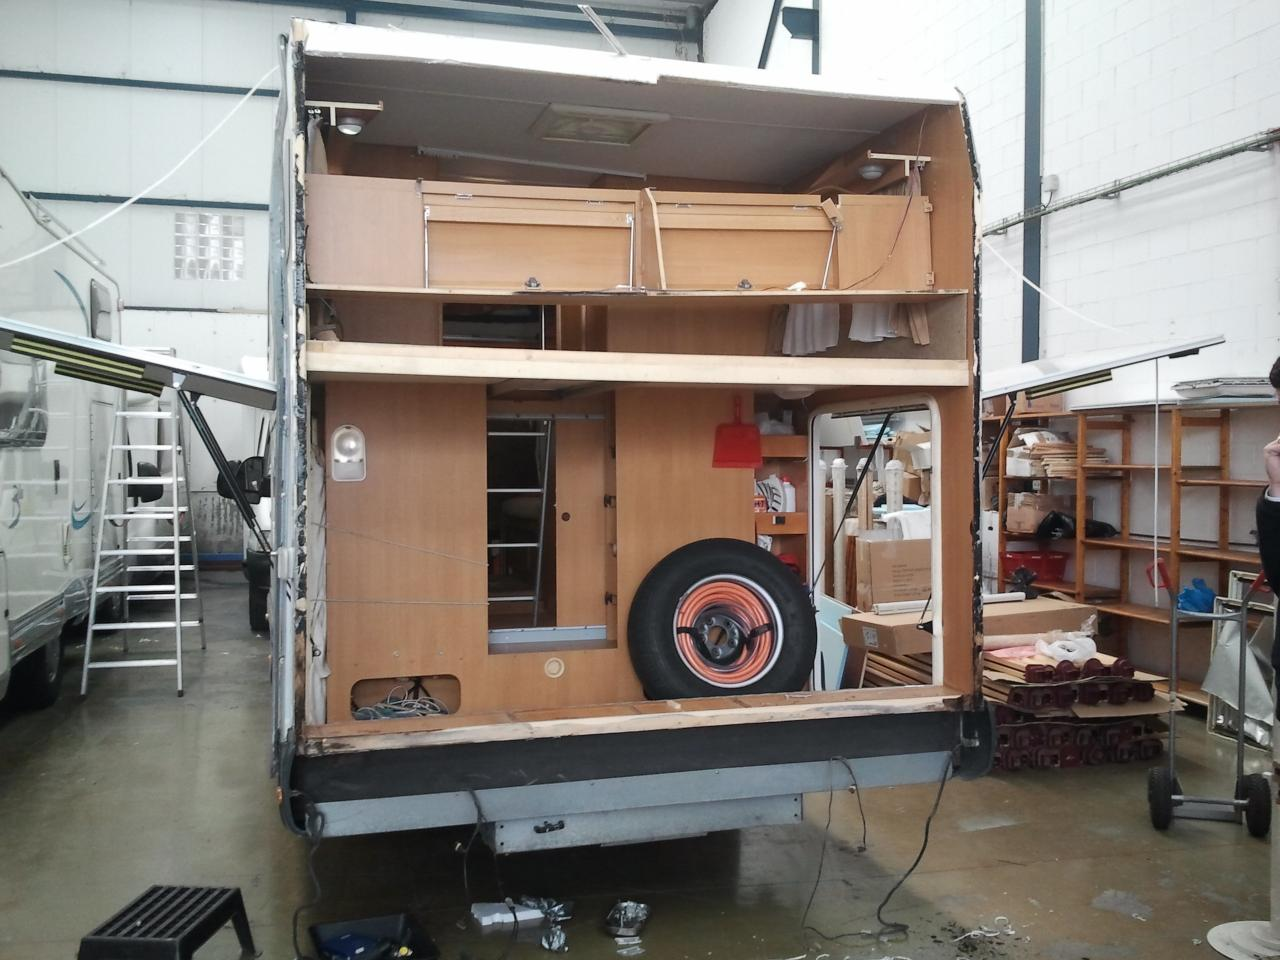 reparation camping car. Black Bedroom Furniture Sets. Home Design Ideas